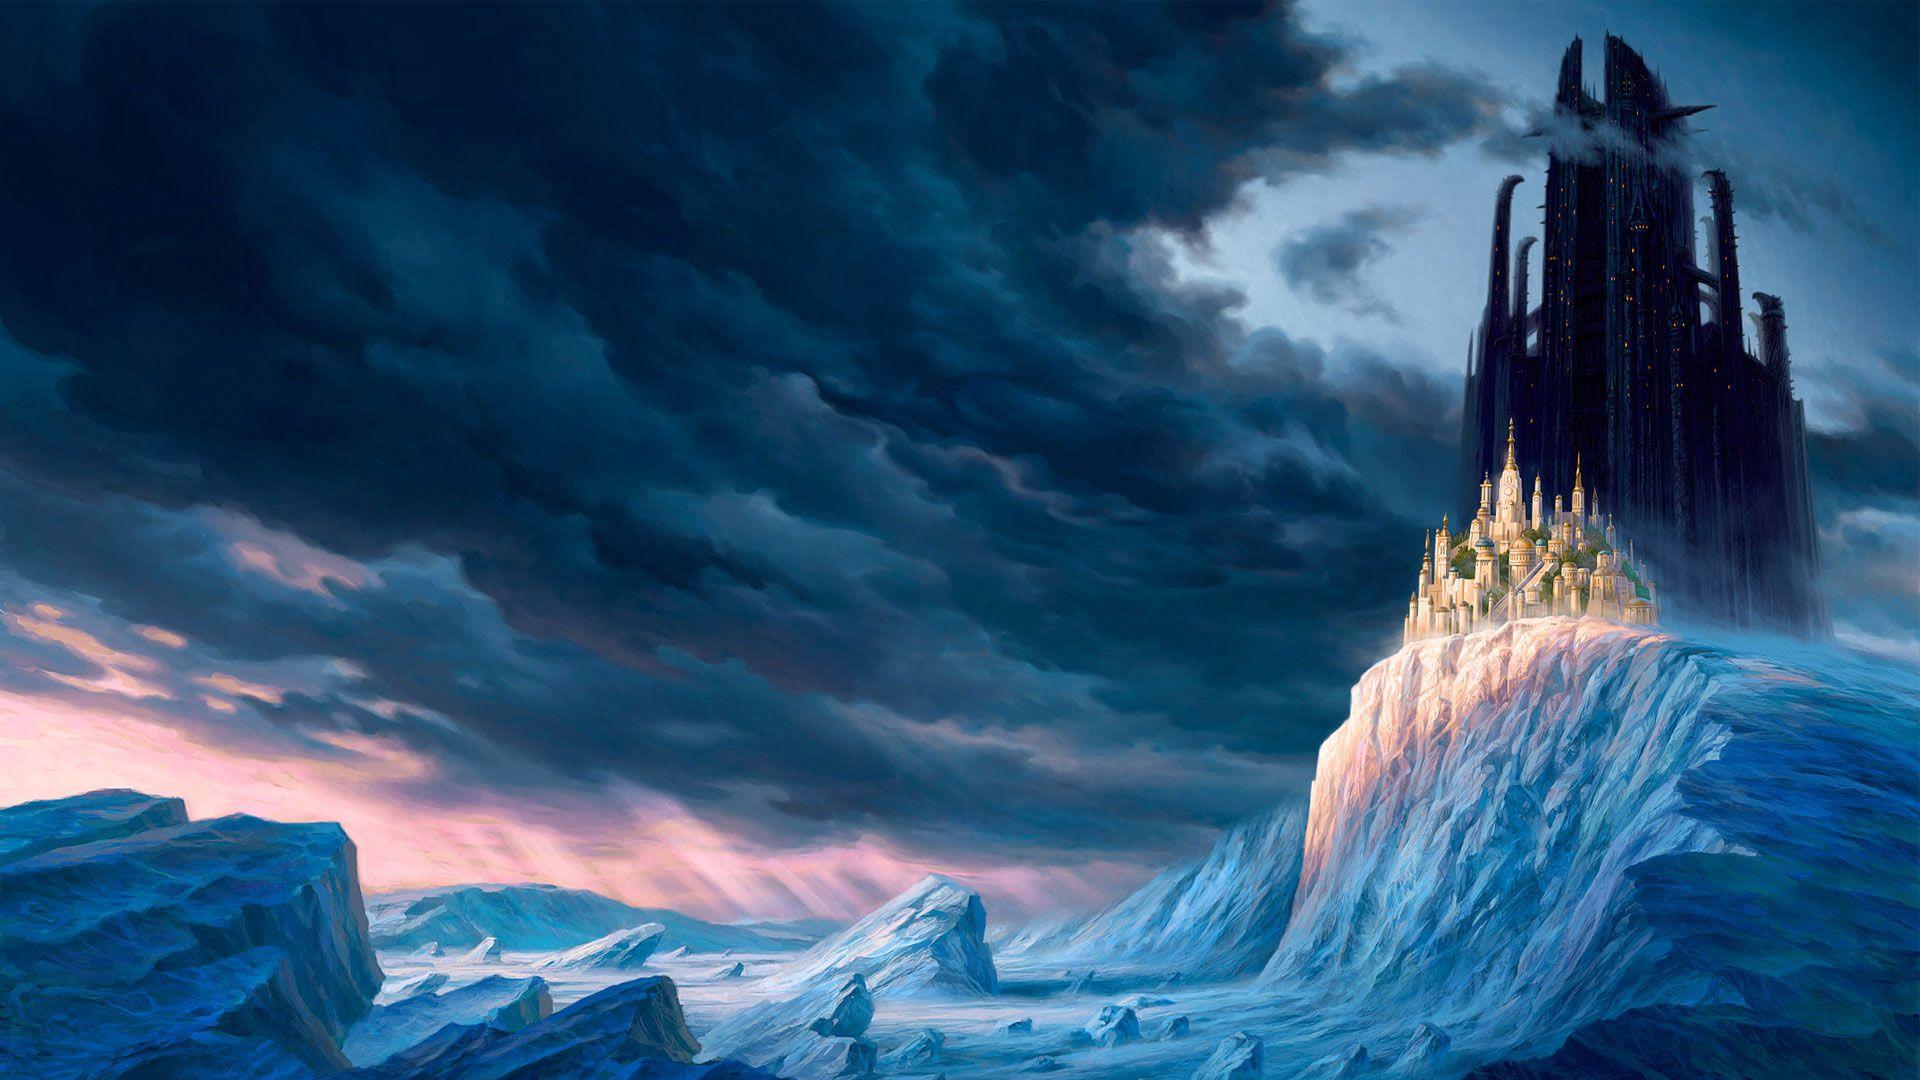 Hd Pics Photos Beautiful Castle Fantasy Snow Ice Winter Sky Hd Quality Desktop Background Wallpaper Fantasy Landscape Fantasy Castle Scenery Wallpaper